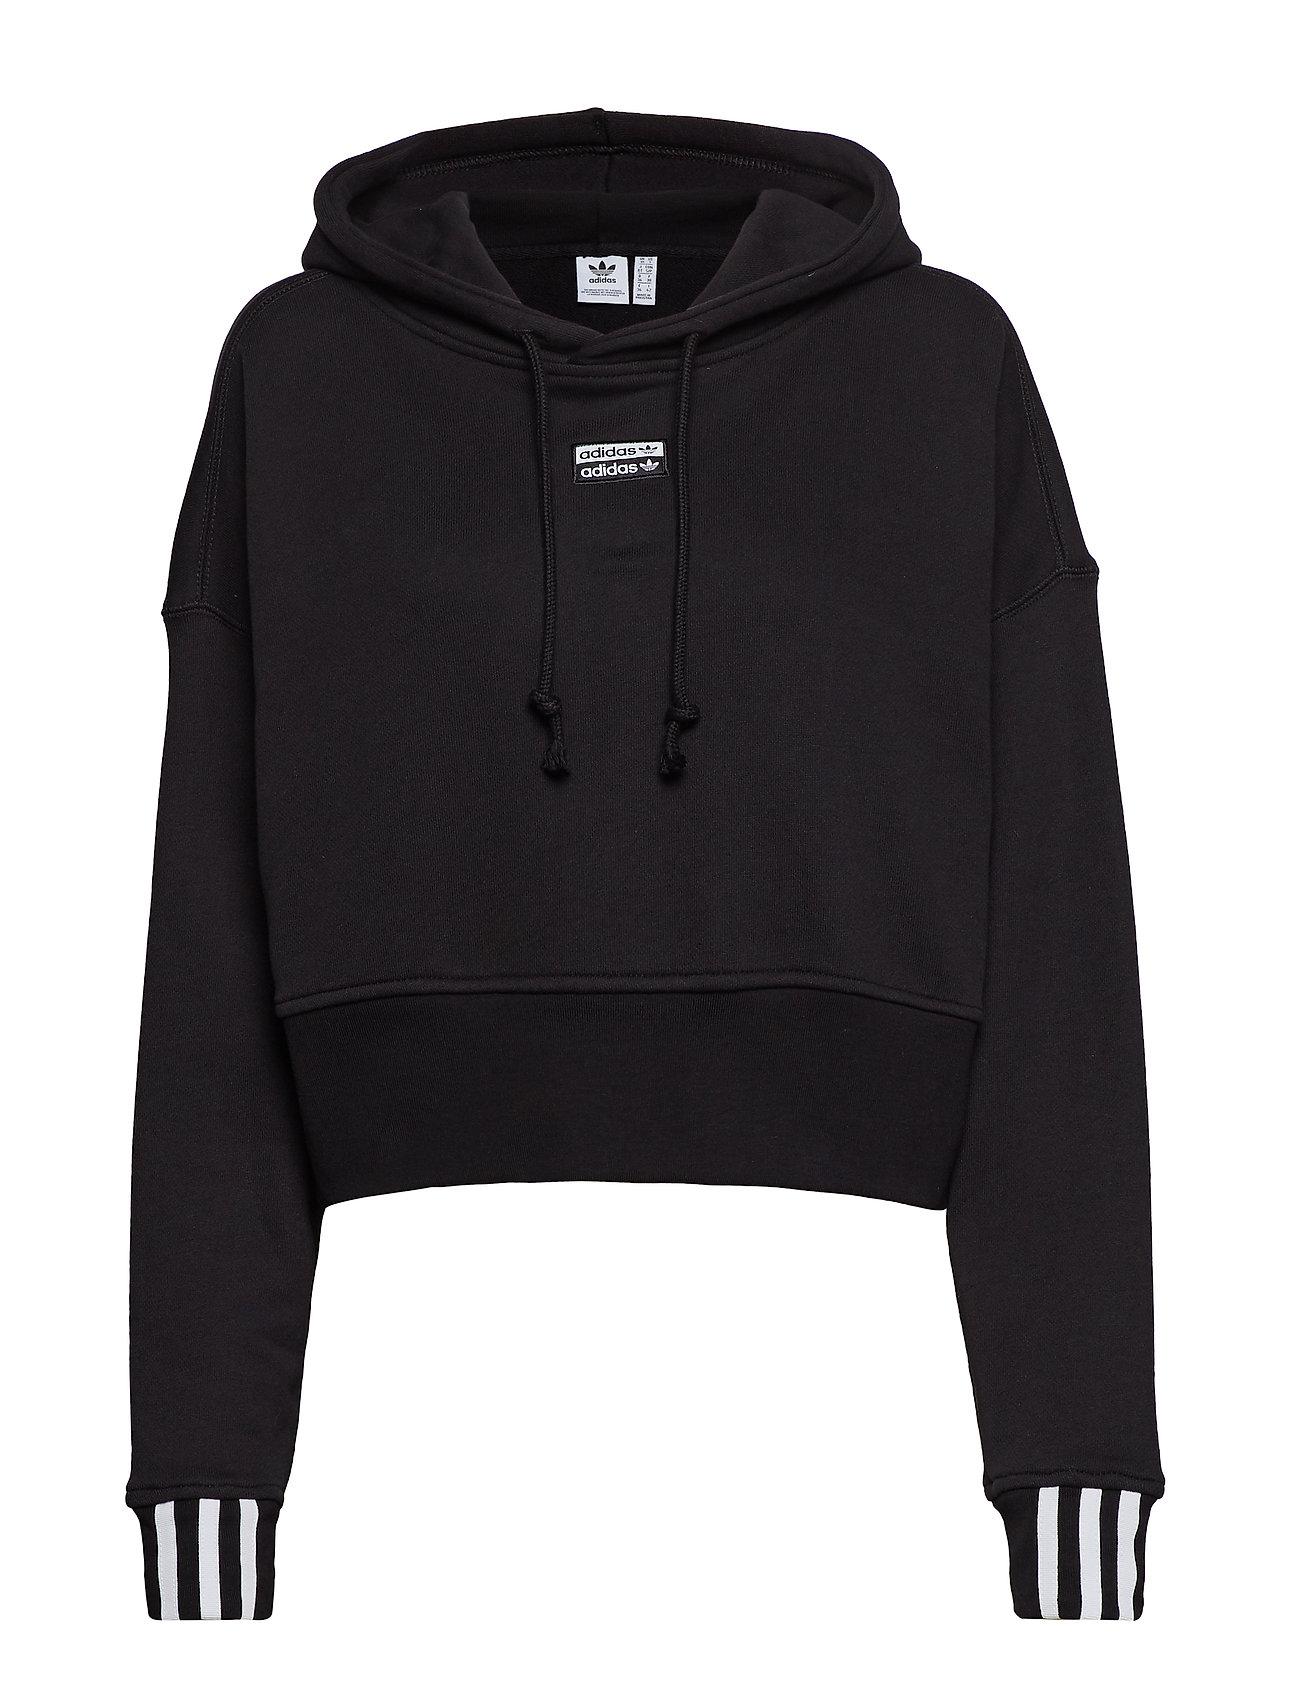 adidas Originals VOCAL CROP HOOD - BLACK